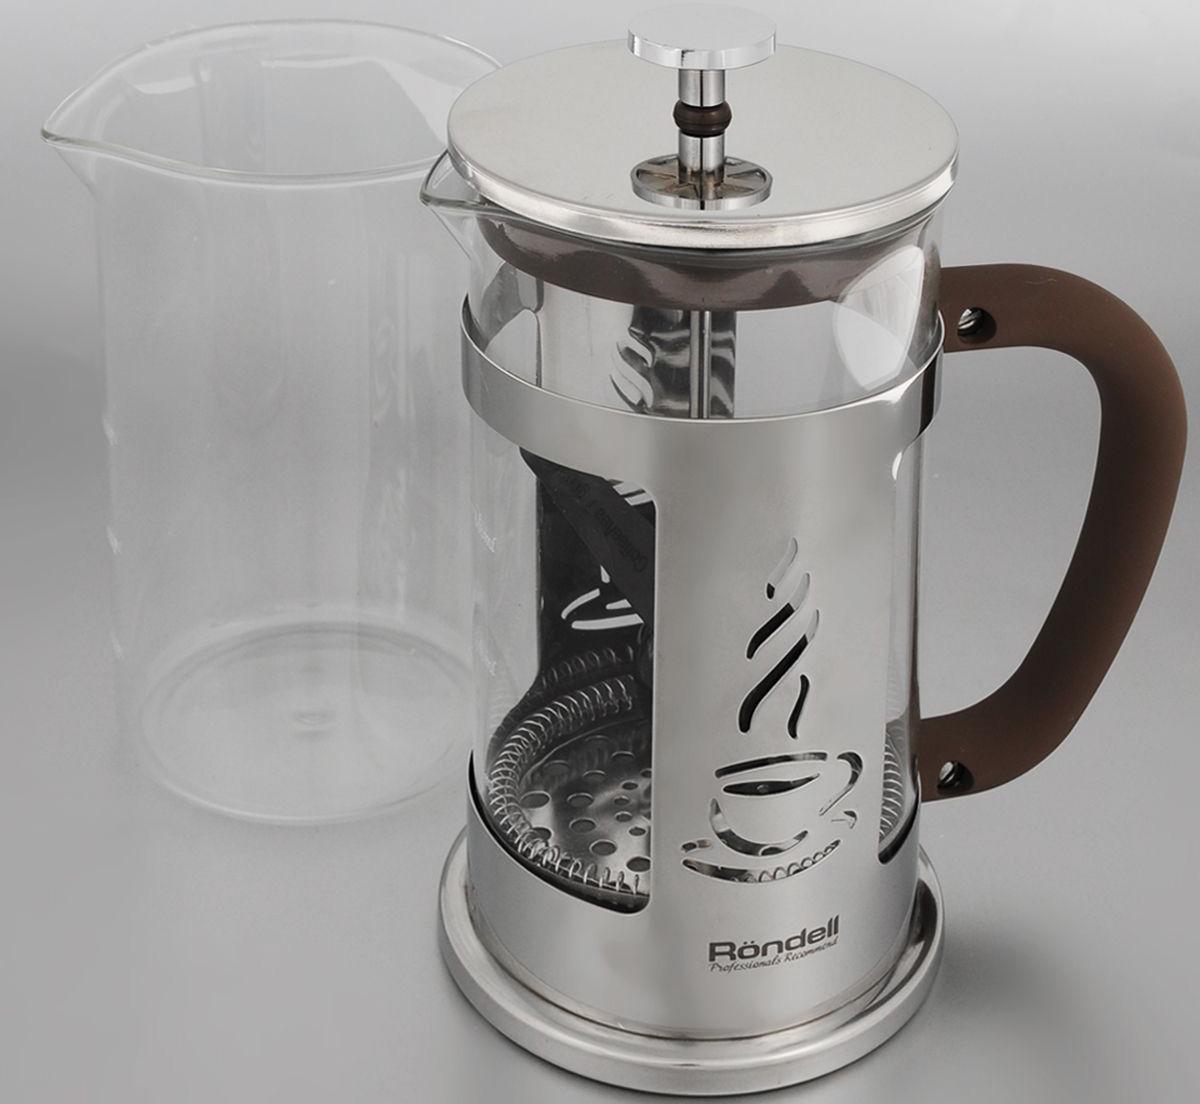 Френч-пресс Rondell Mocco&Latte RDS-490